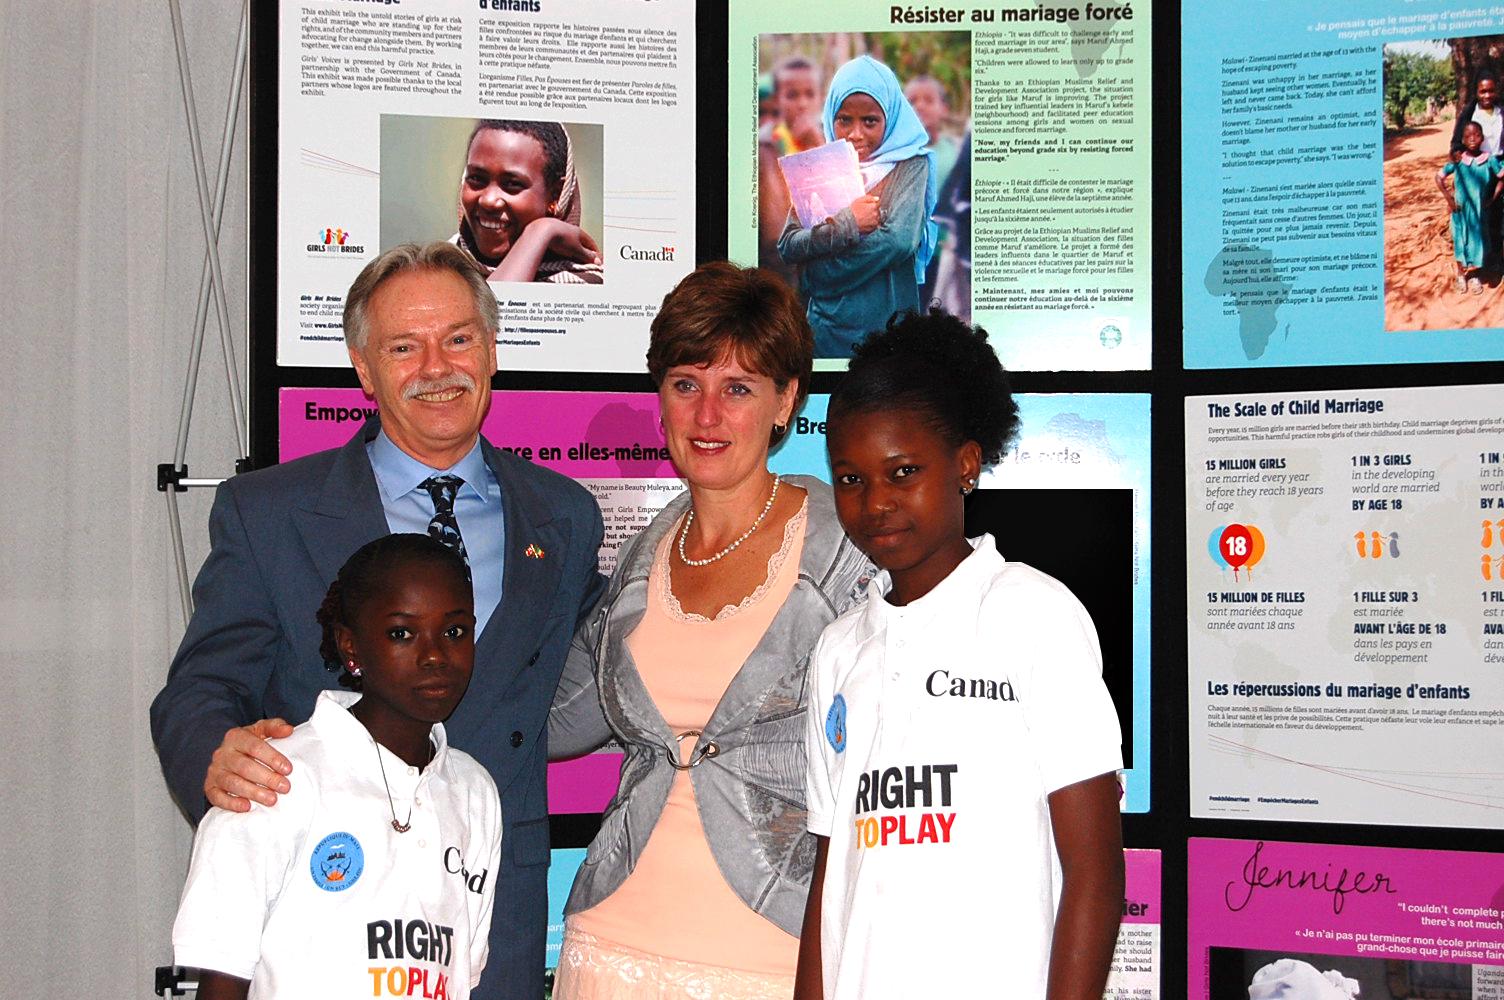 Minister Bibeau & Canadian Ambassador